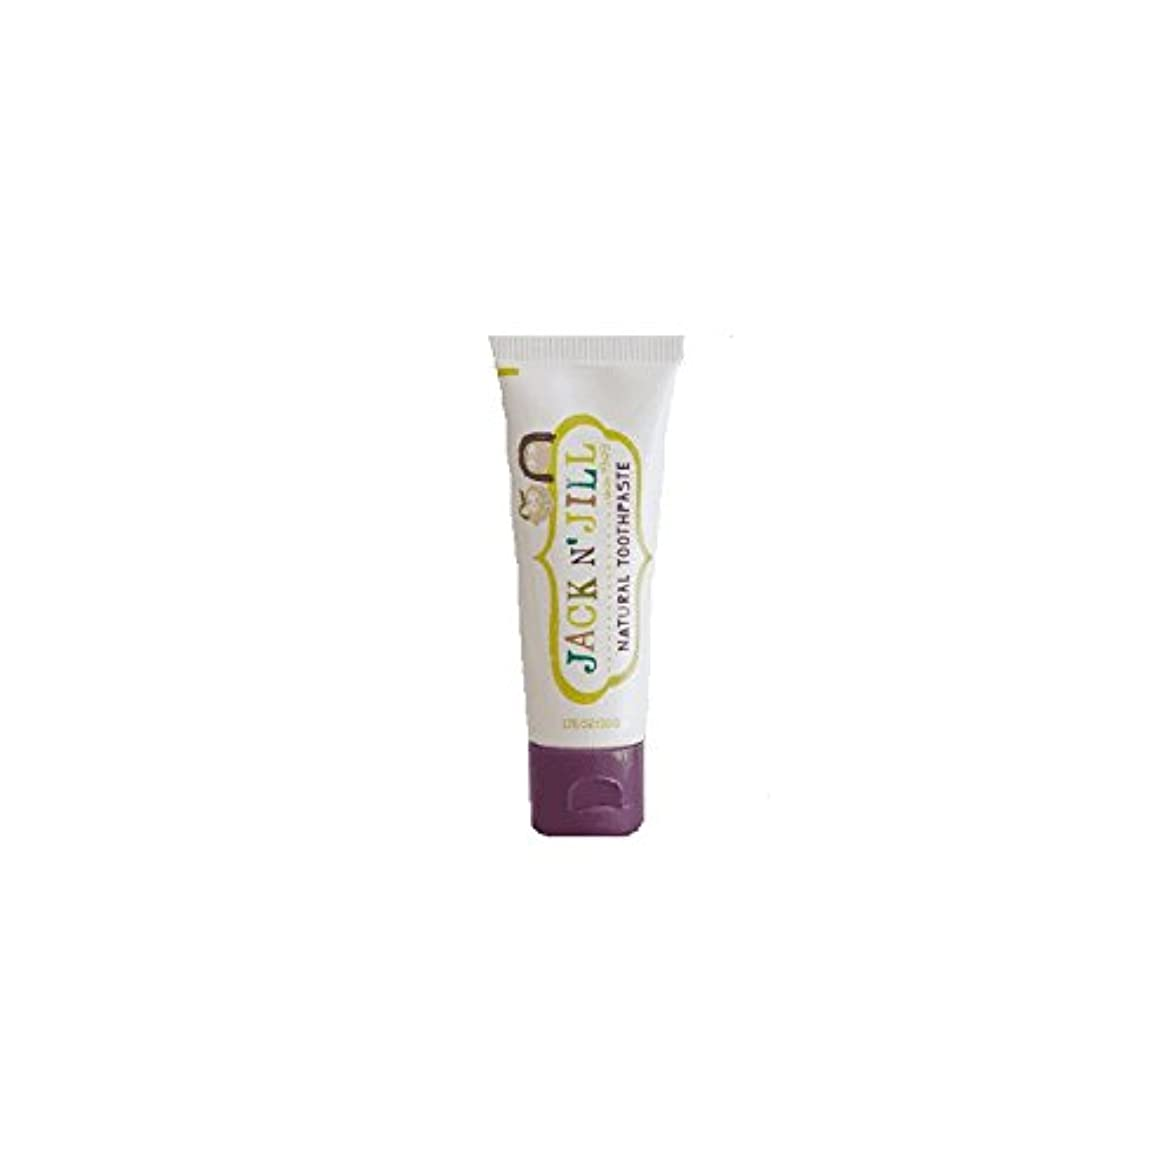 Jack N' Jill Natural Toothpaste Organic Blackcurrant 50g (Pack of 2) - ジャックN 'はジルの天然歯磨き粉有機ブラックカラント50グラム (x2) [...